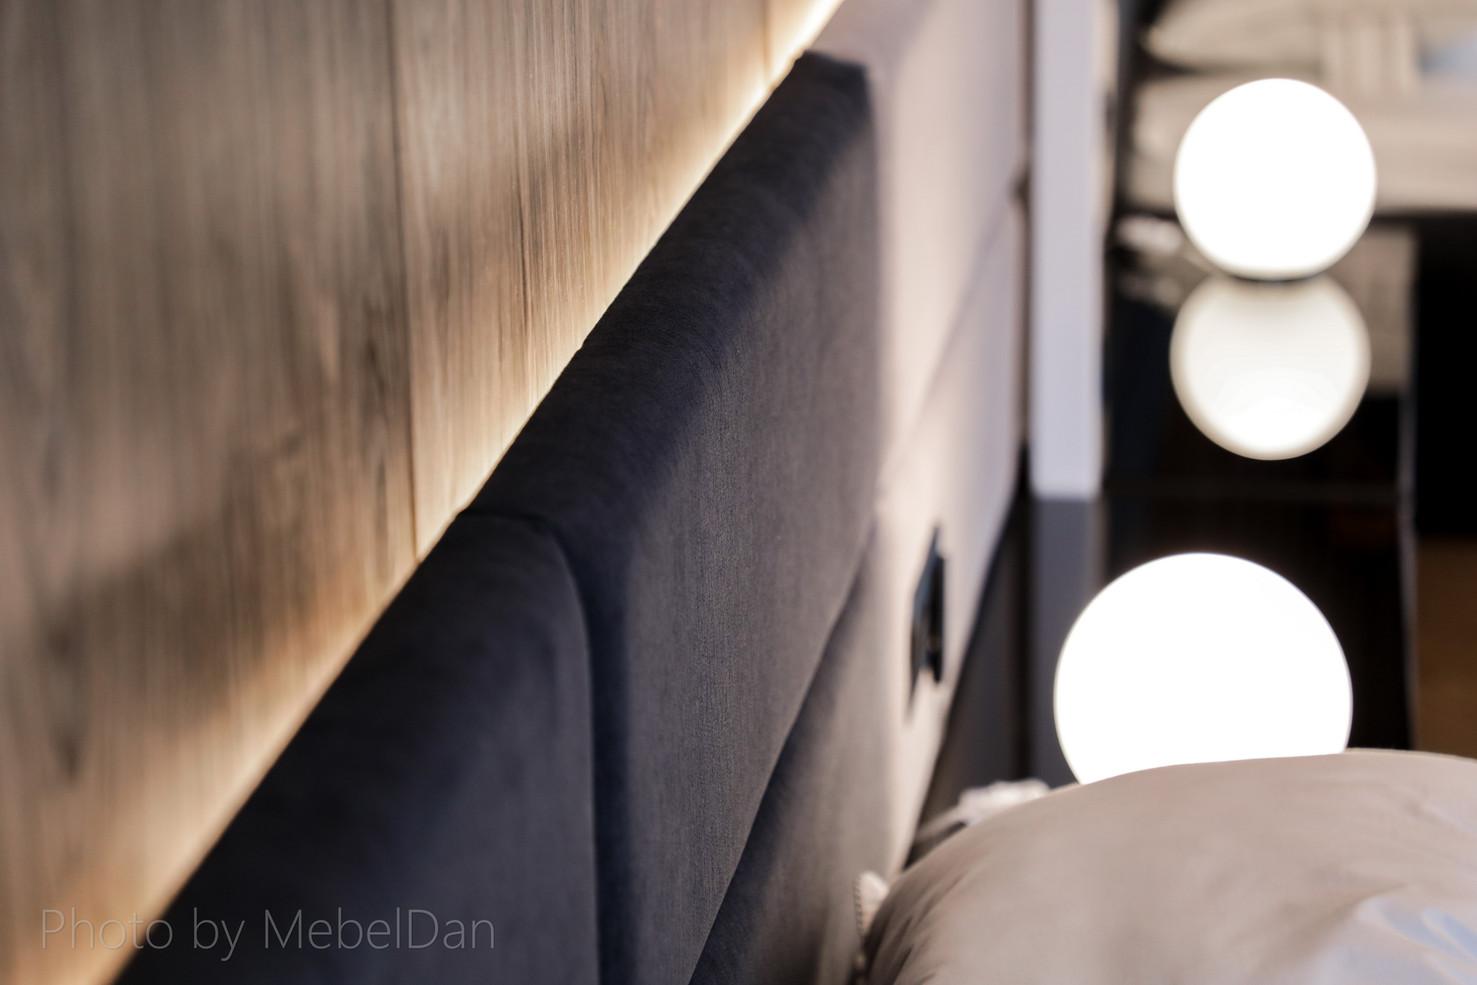 МебельДан-51_новый размер.jpg